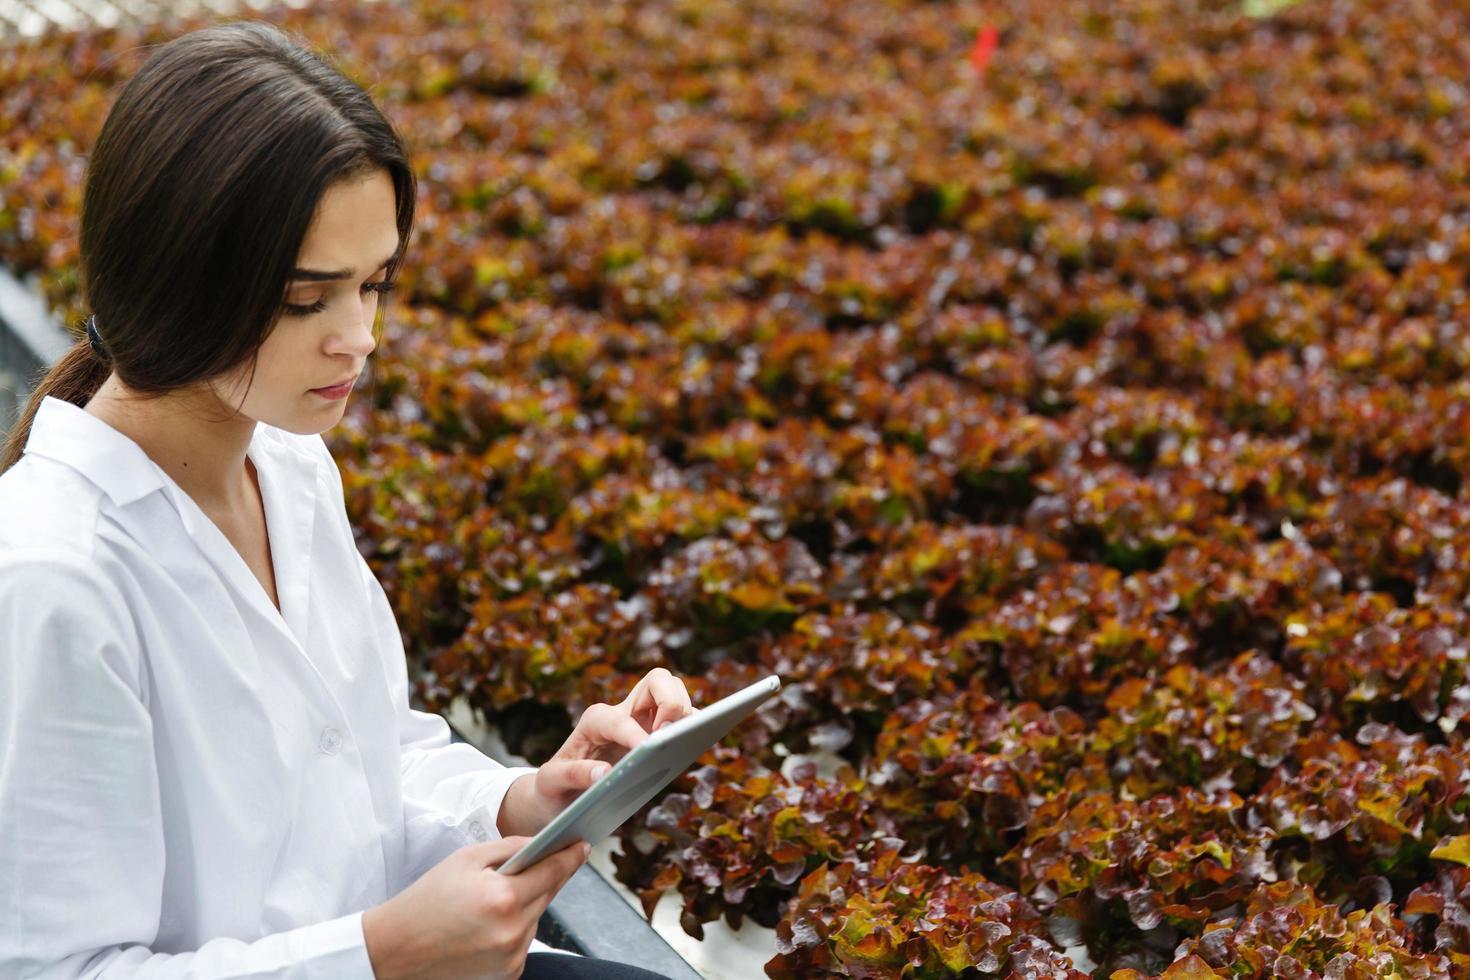 vrouw in witte laboratoriumjas onderzoekt salade foto